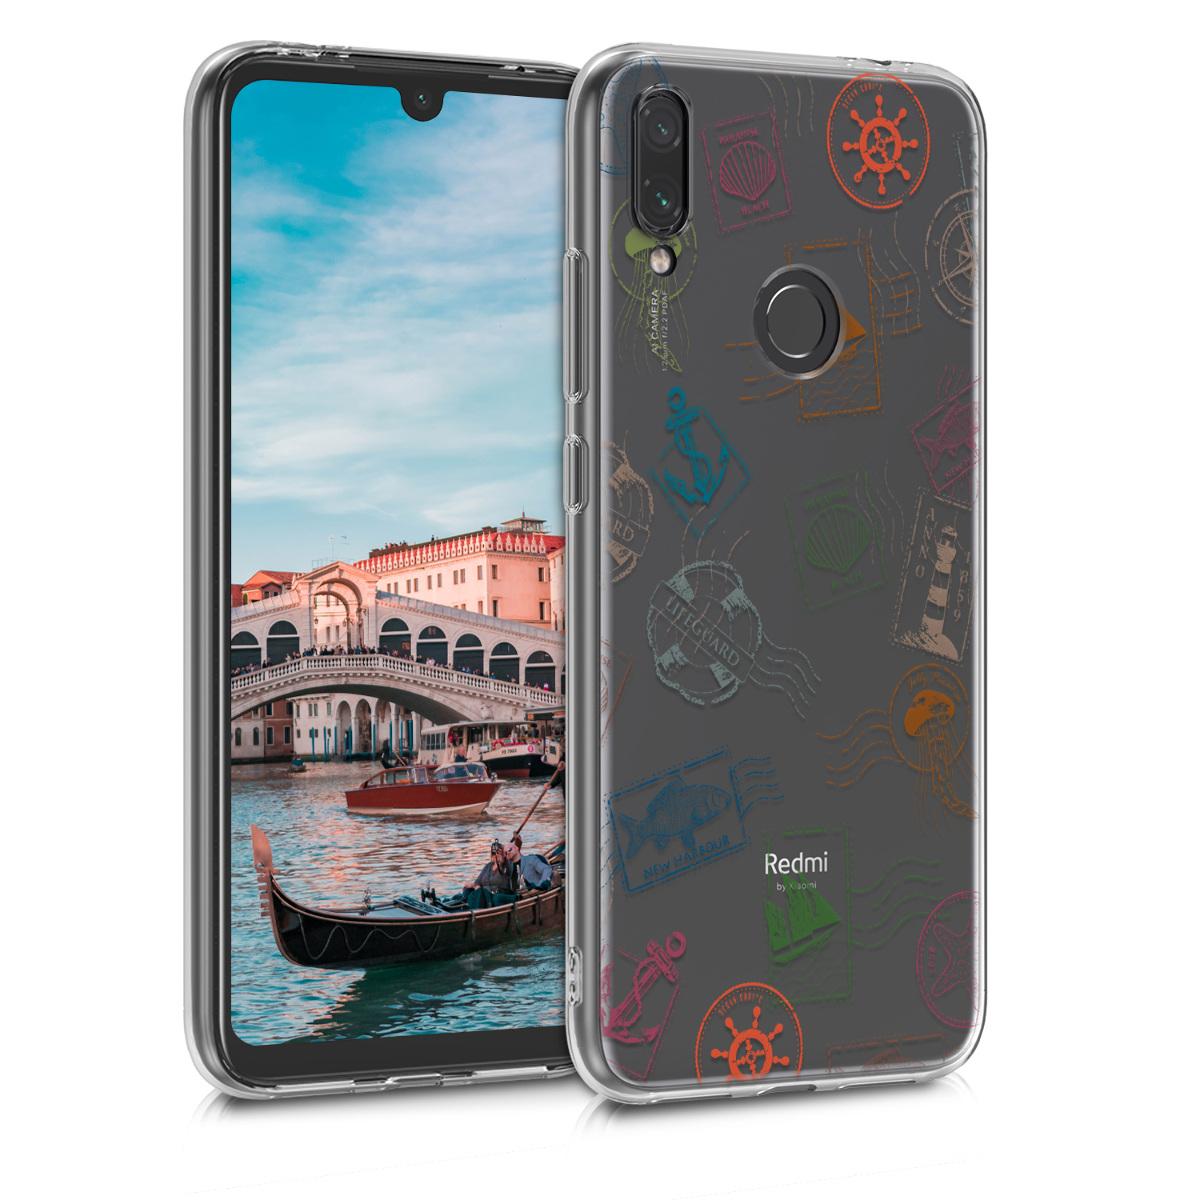 KW Θήκη Σιλικόνης Xiaomi Redmi Note 7 / Note 7 Pro - Green / Blue / Transparent (48156.04)